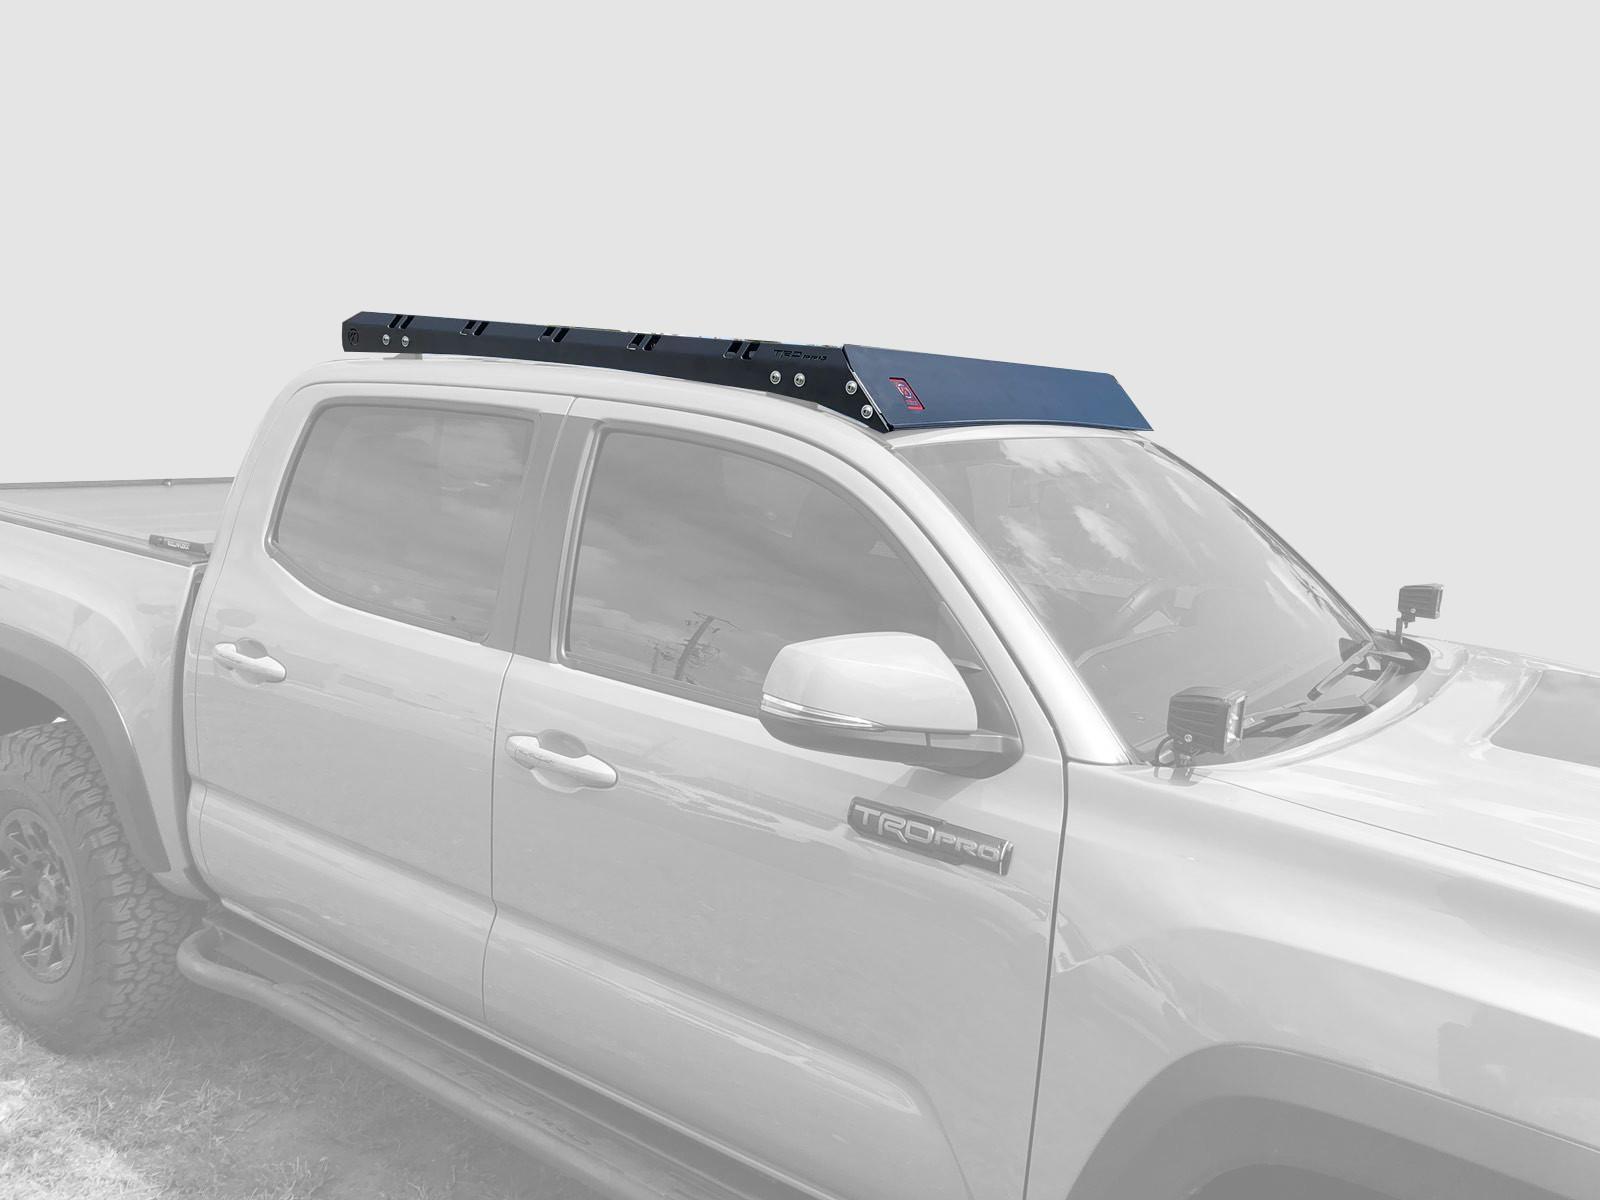 Overlander Roof Tent Dimensions Pop Up Fiberglass Hard